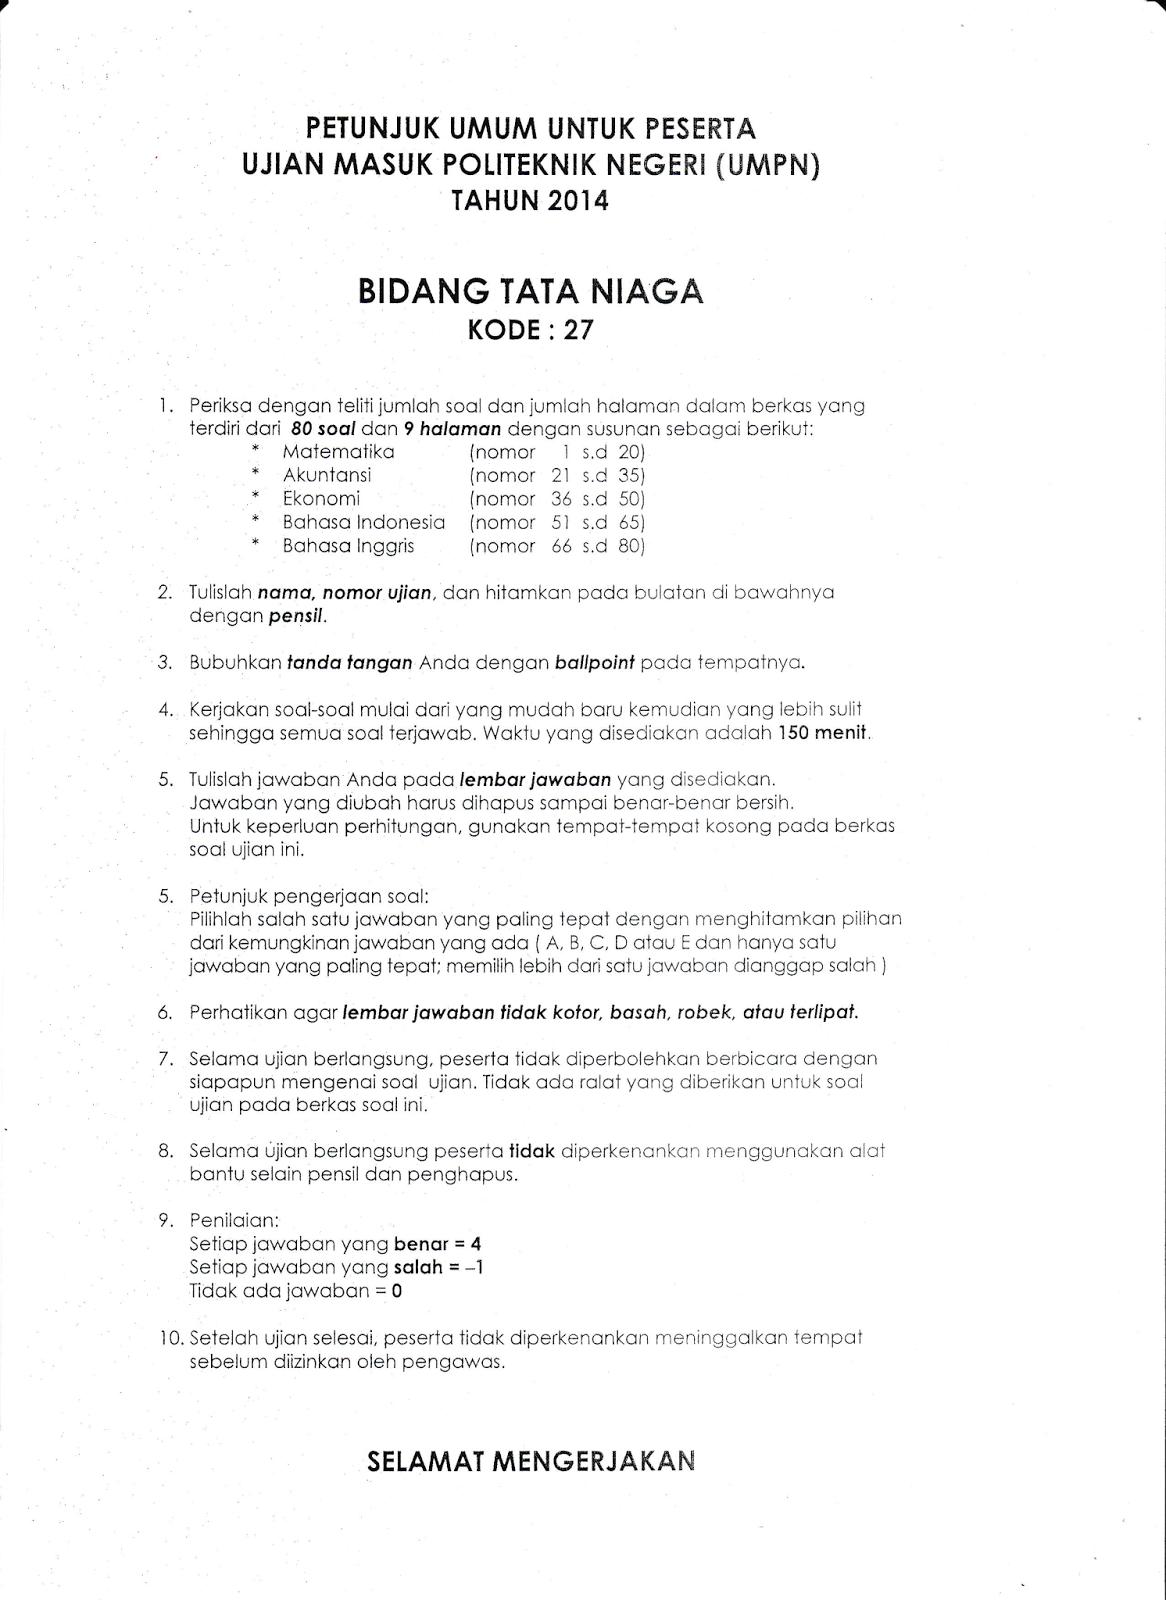 My Way Naskah Soal Umpn 2014 Bidang Tata Niaga